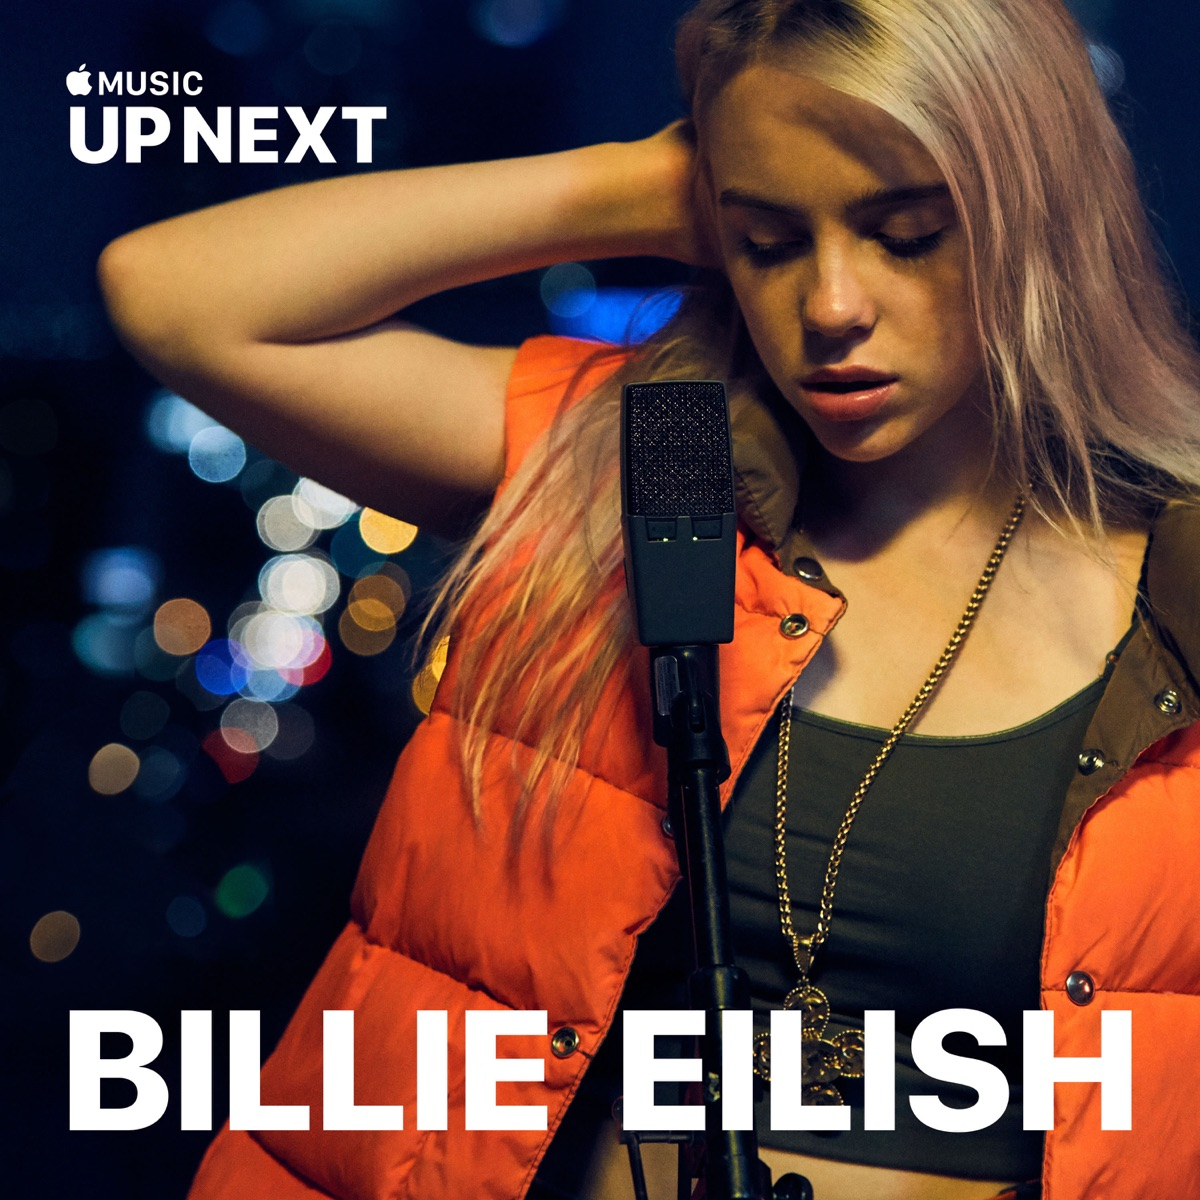 Up Next Session Billie Eilish Live - Single Billie Eilish CD cover